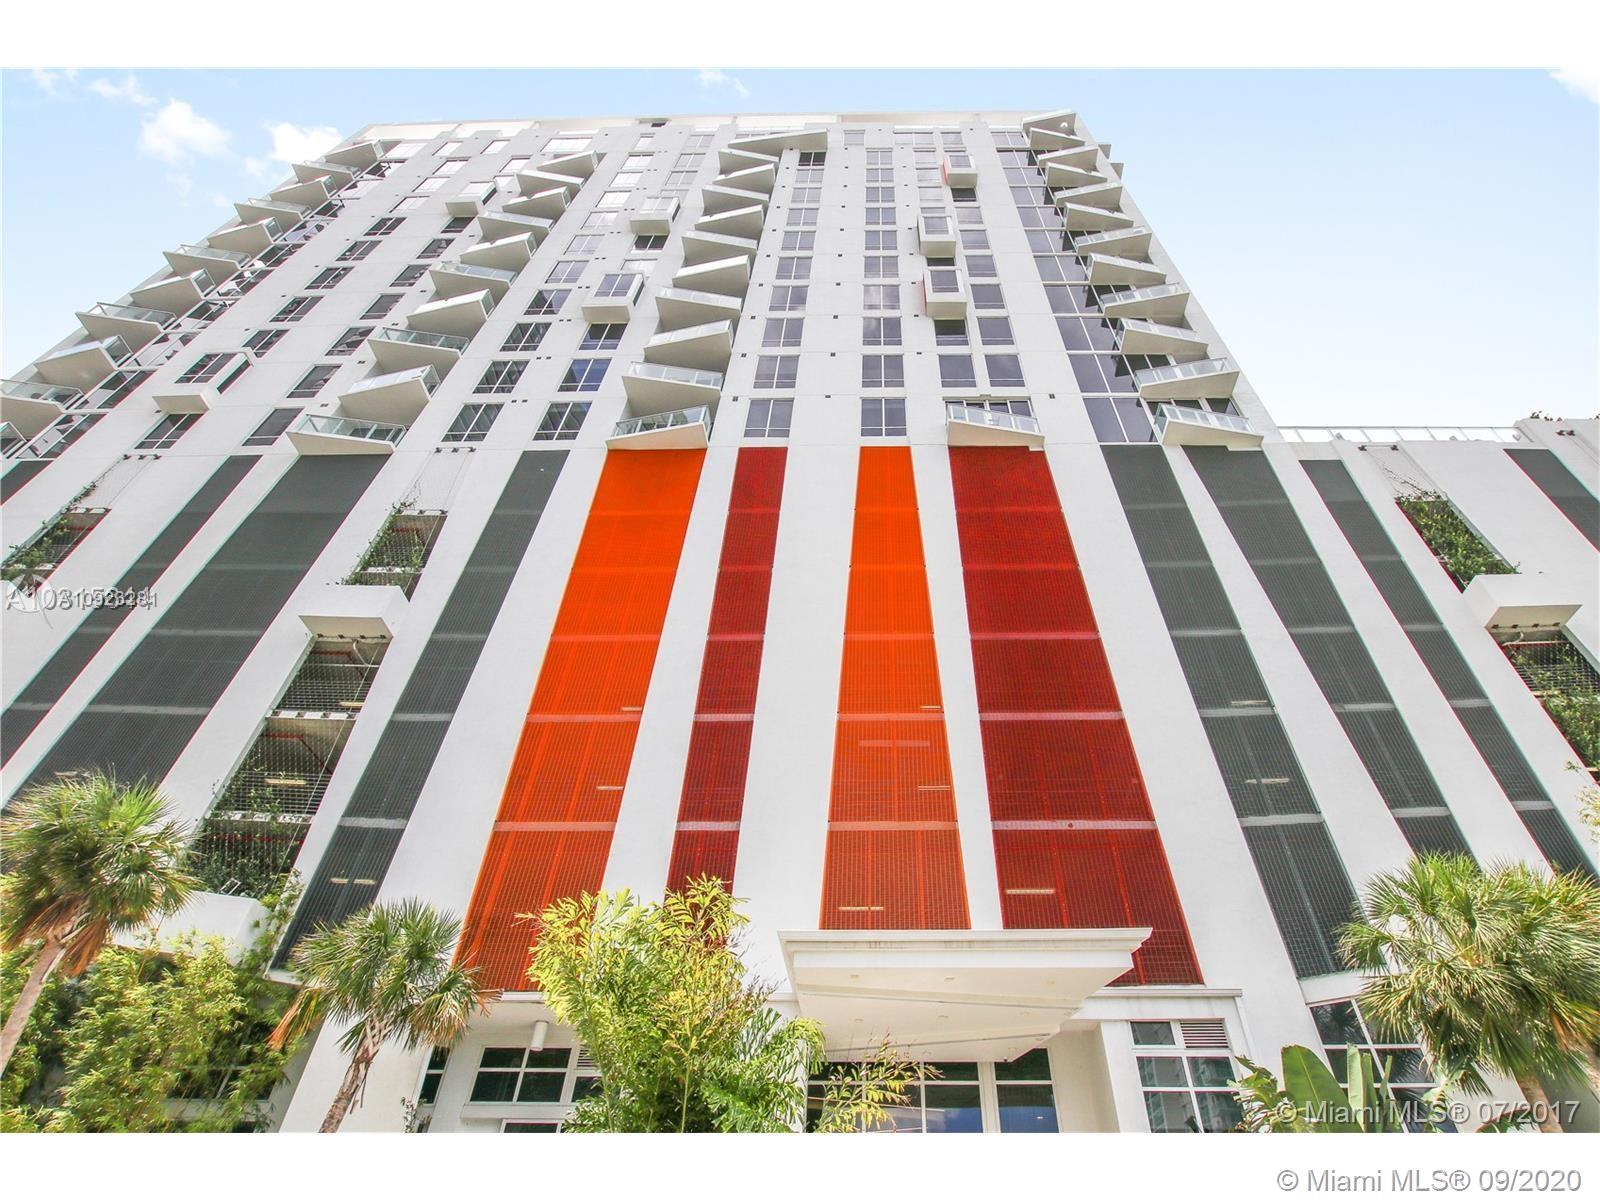 BEAUTIFUL NEW CONSTRUCTION UNIT 1BED/1BATH + DEN. CHARMING BOUTIQUE BUILDING INCLUDES FITNESS CENTER